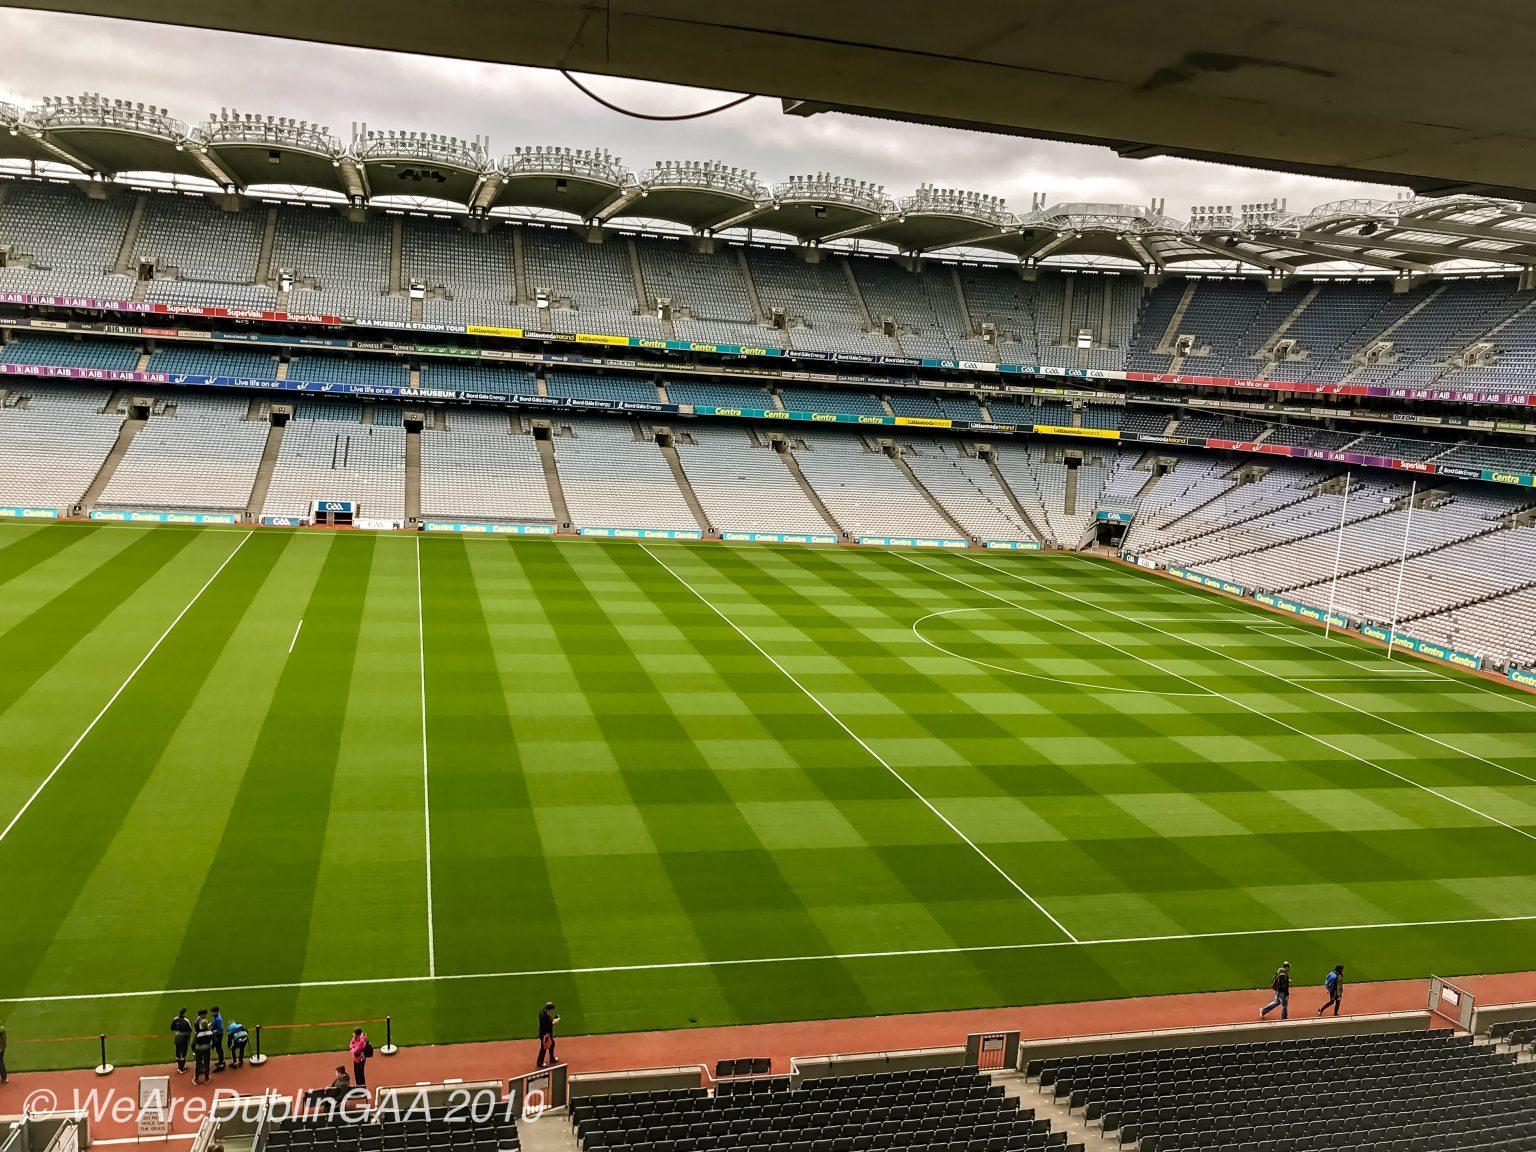 Image of Croke Park Stadium where Tyrone manager Mickey Harte is releshing playing Dublin